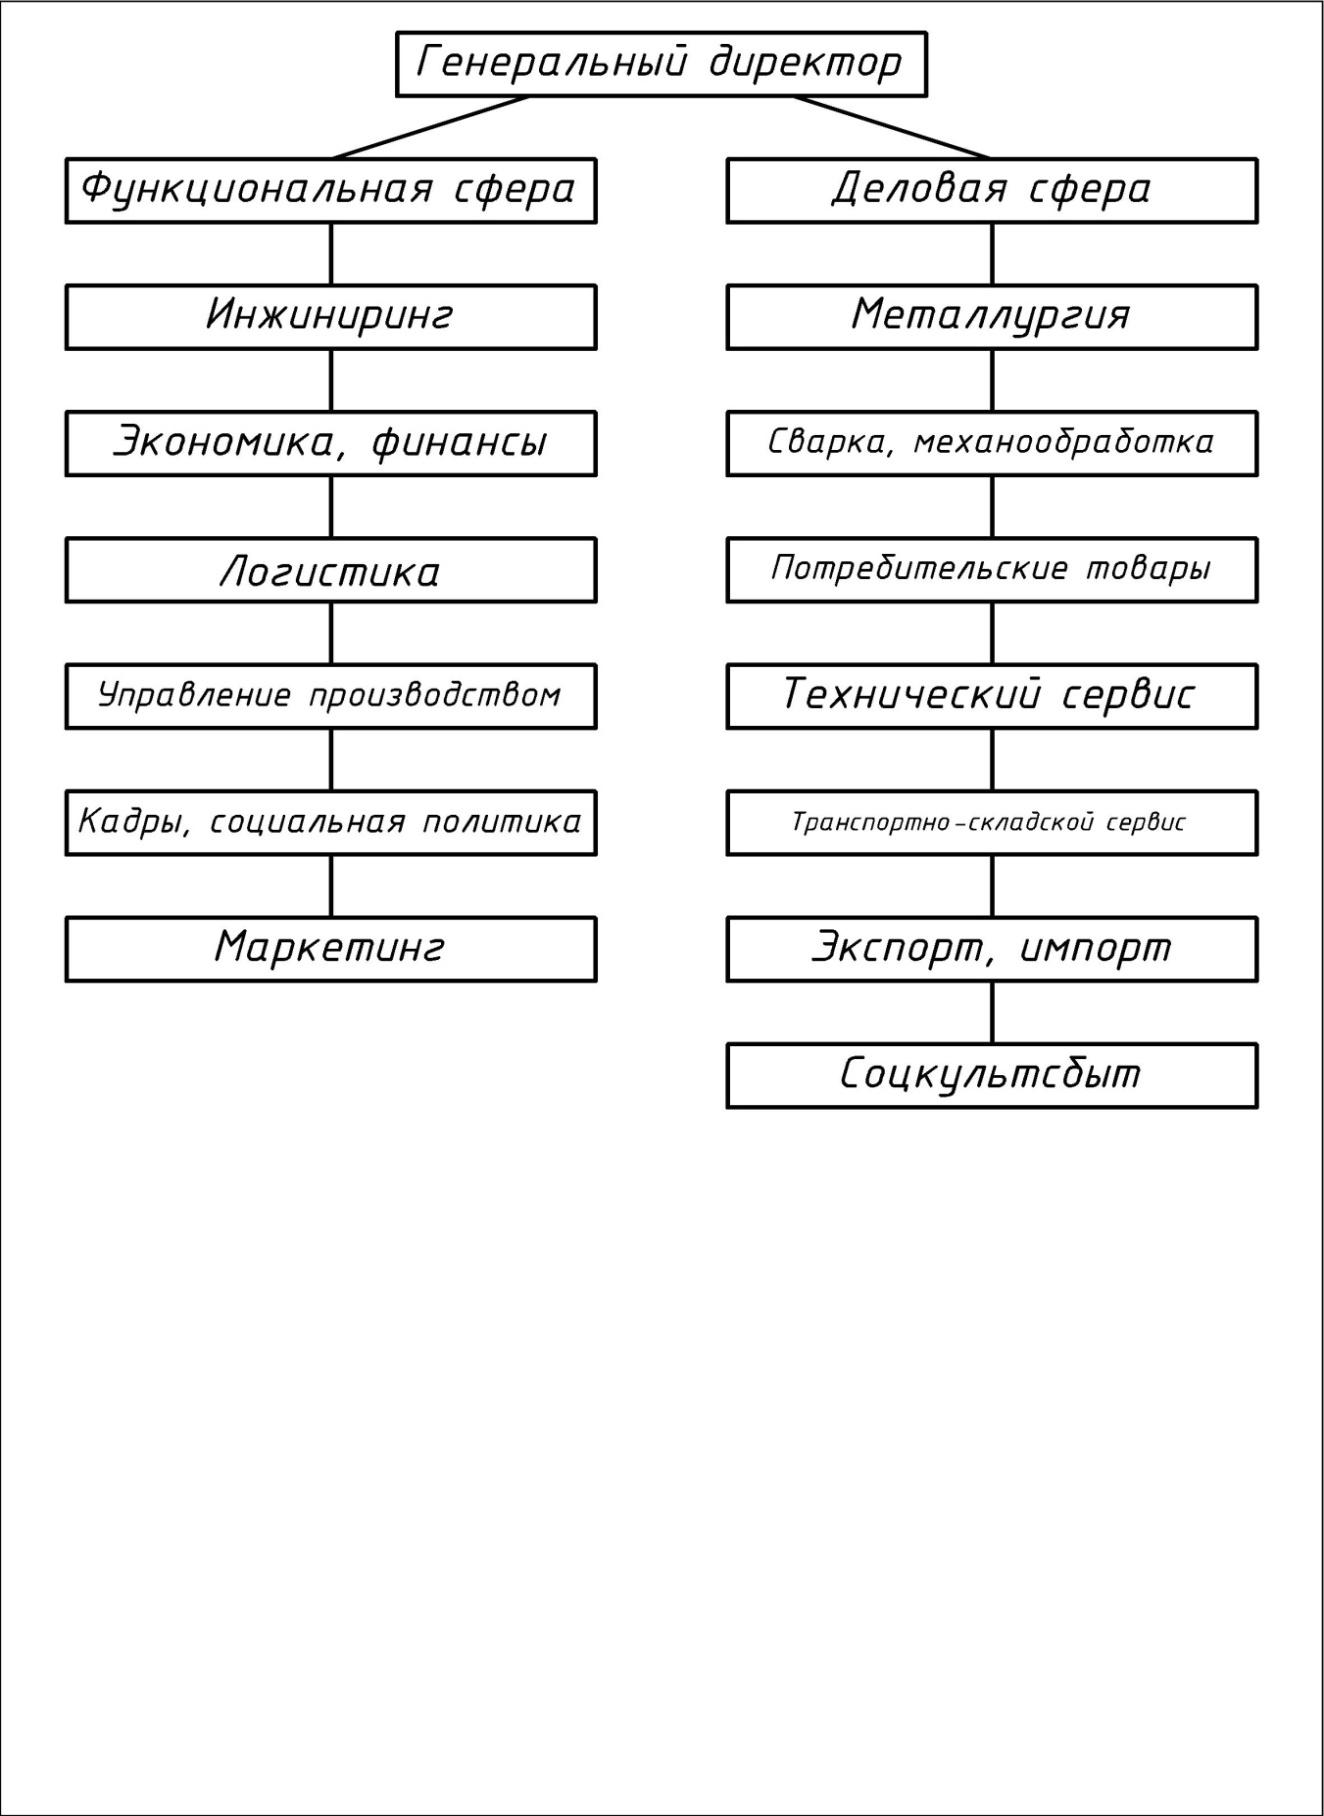 Структура подразделений предприятия схема фото 206